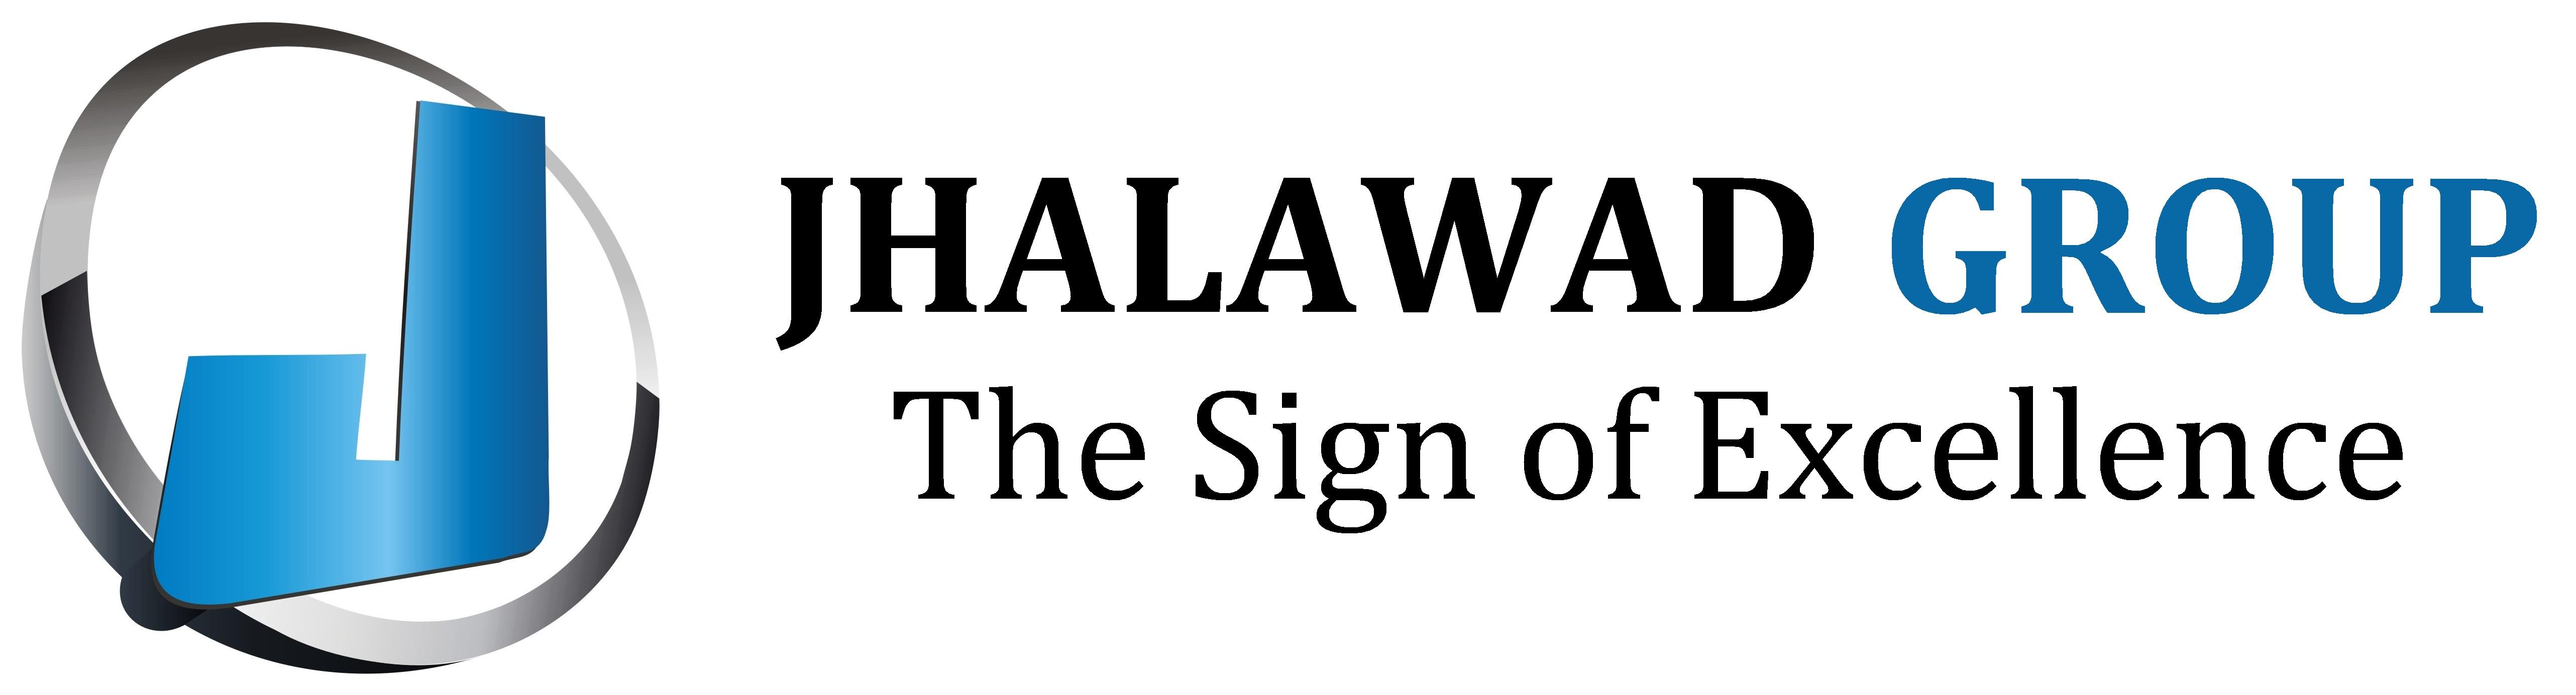 Jhalawad Group – Shalabh Agencies, Shubham Marketing, Primus Engineering